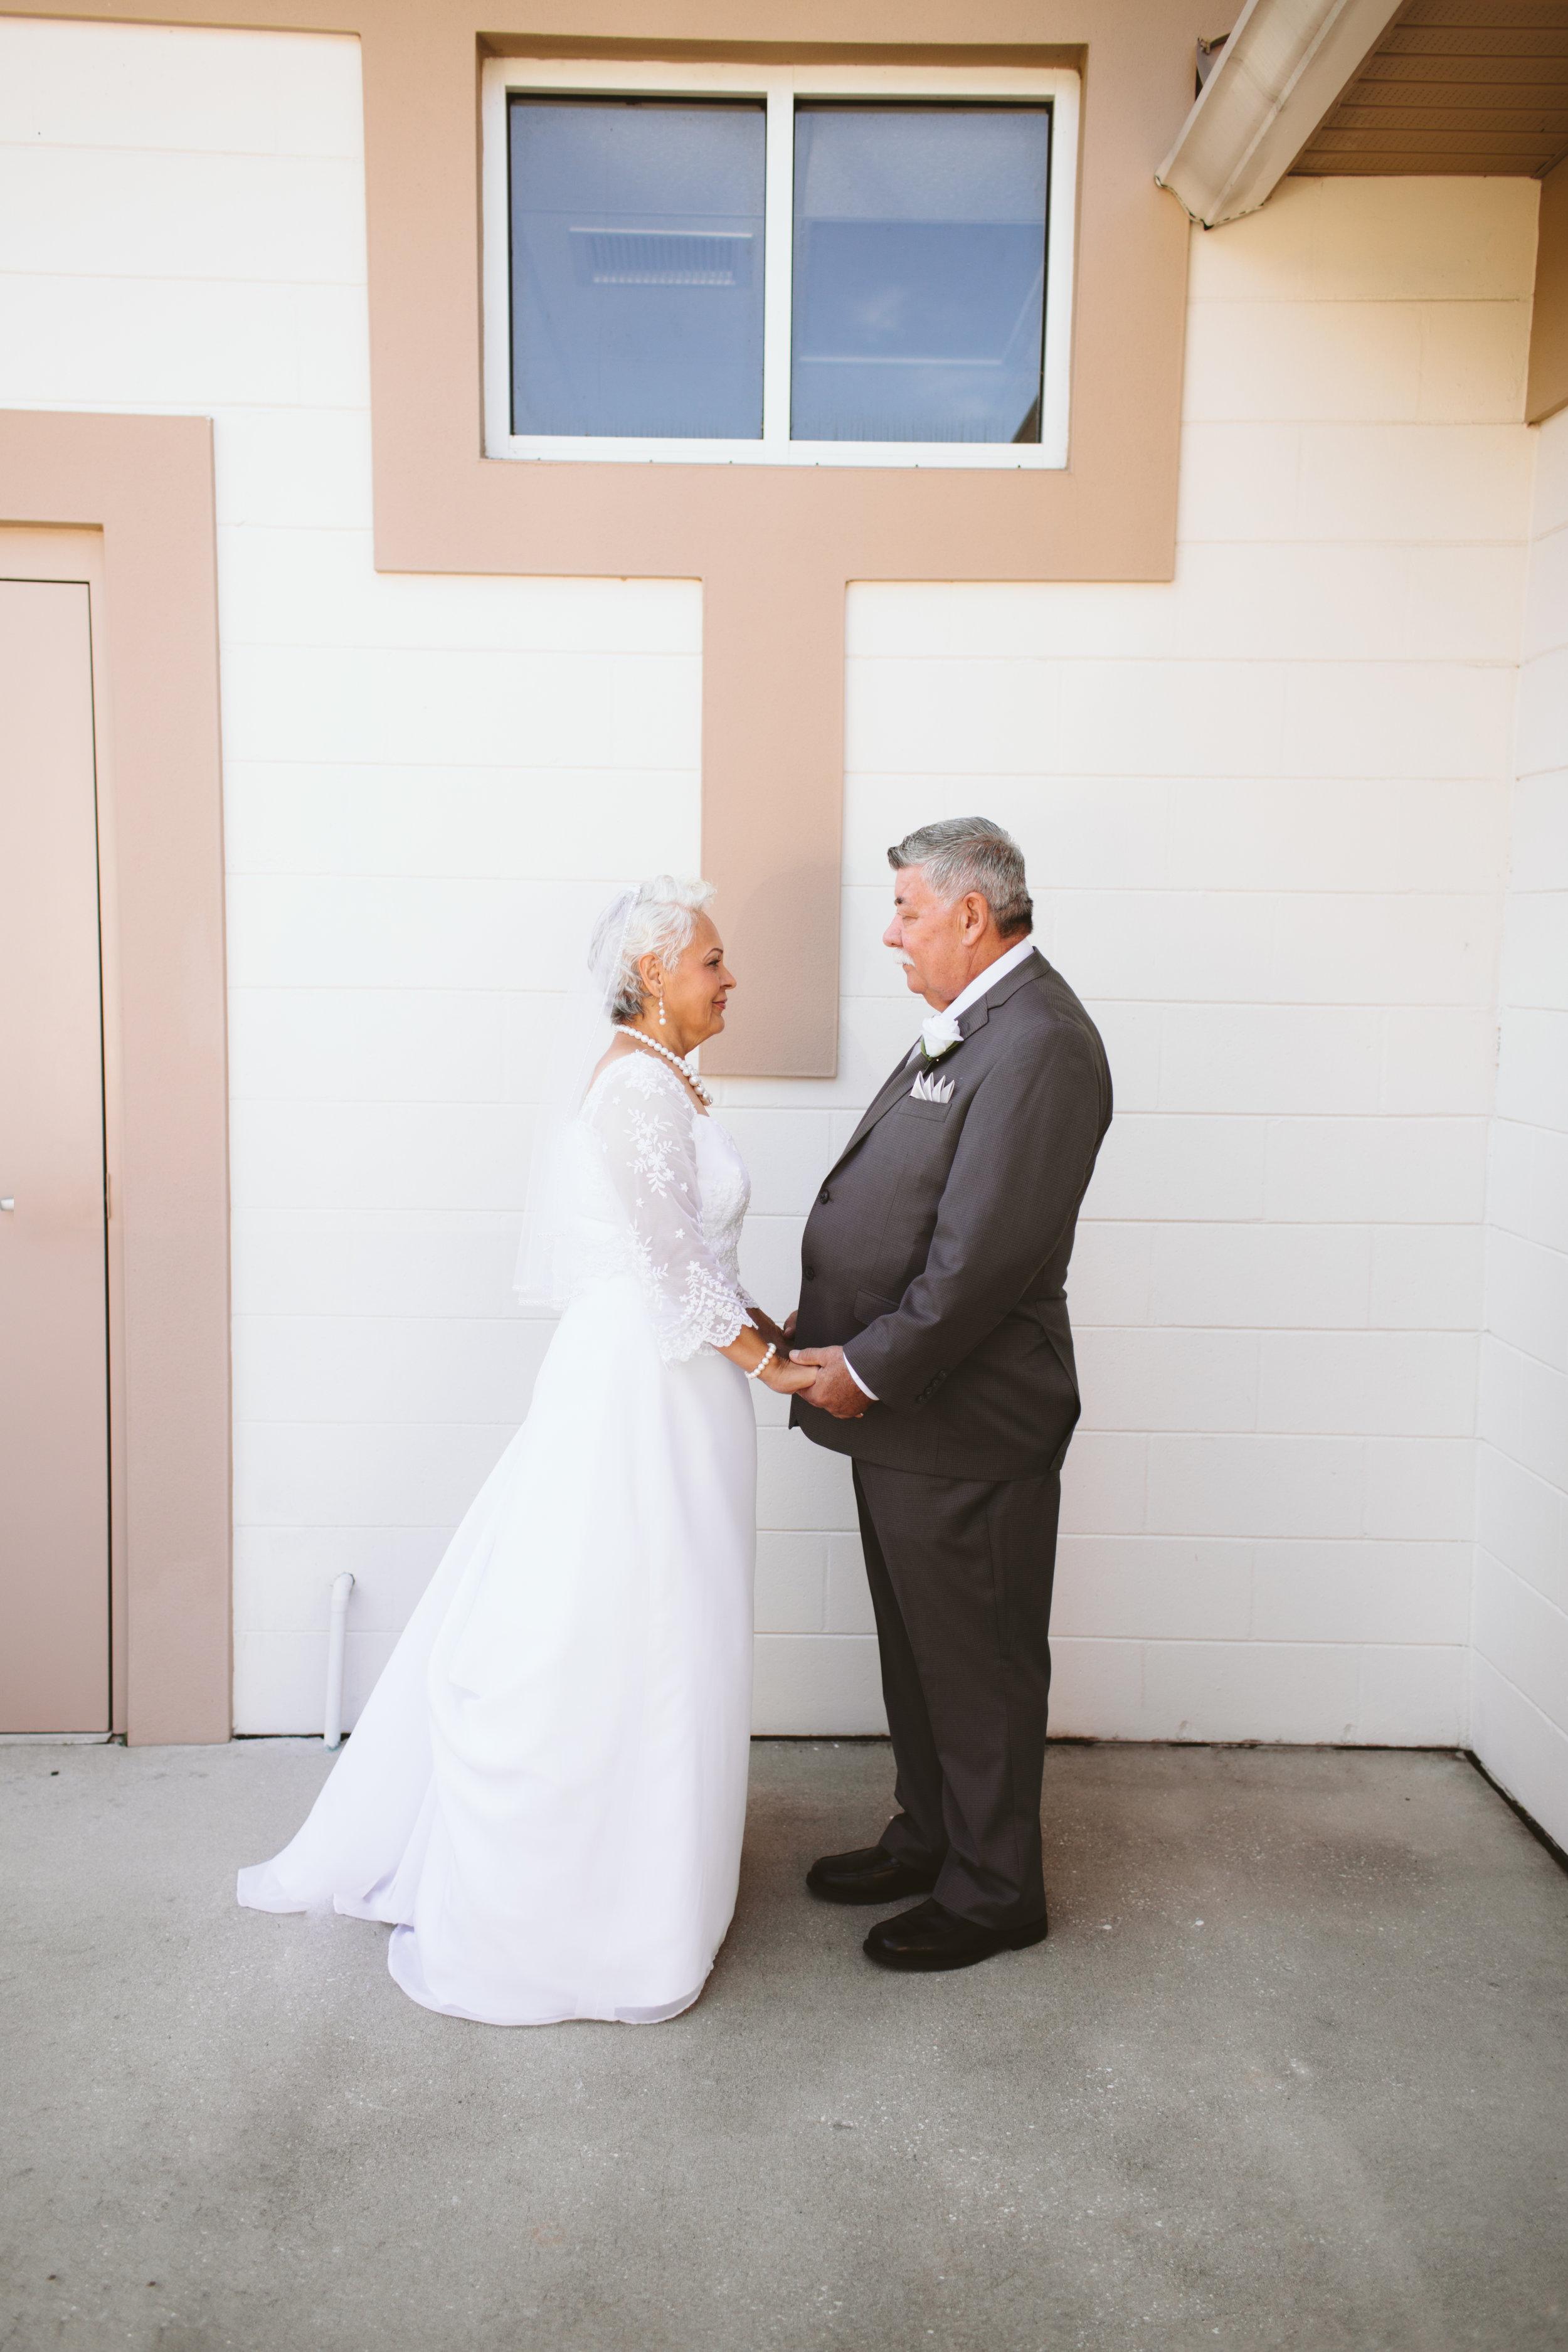 wedding | Vanessa Boy Photography | vanessaboy.com |-71.jpg